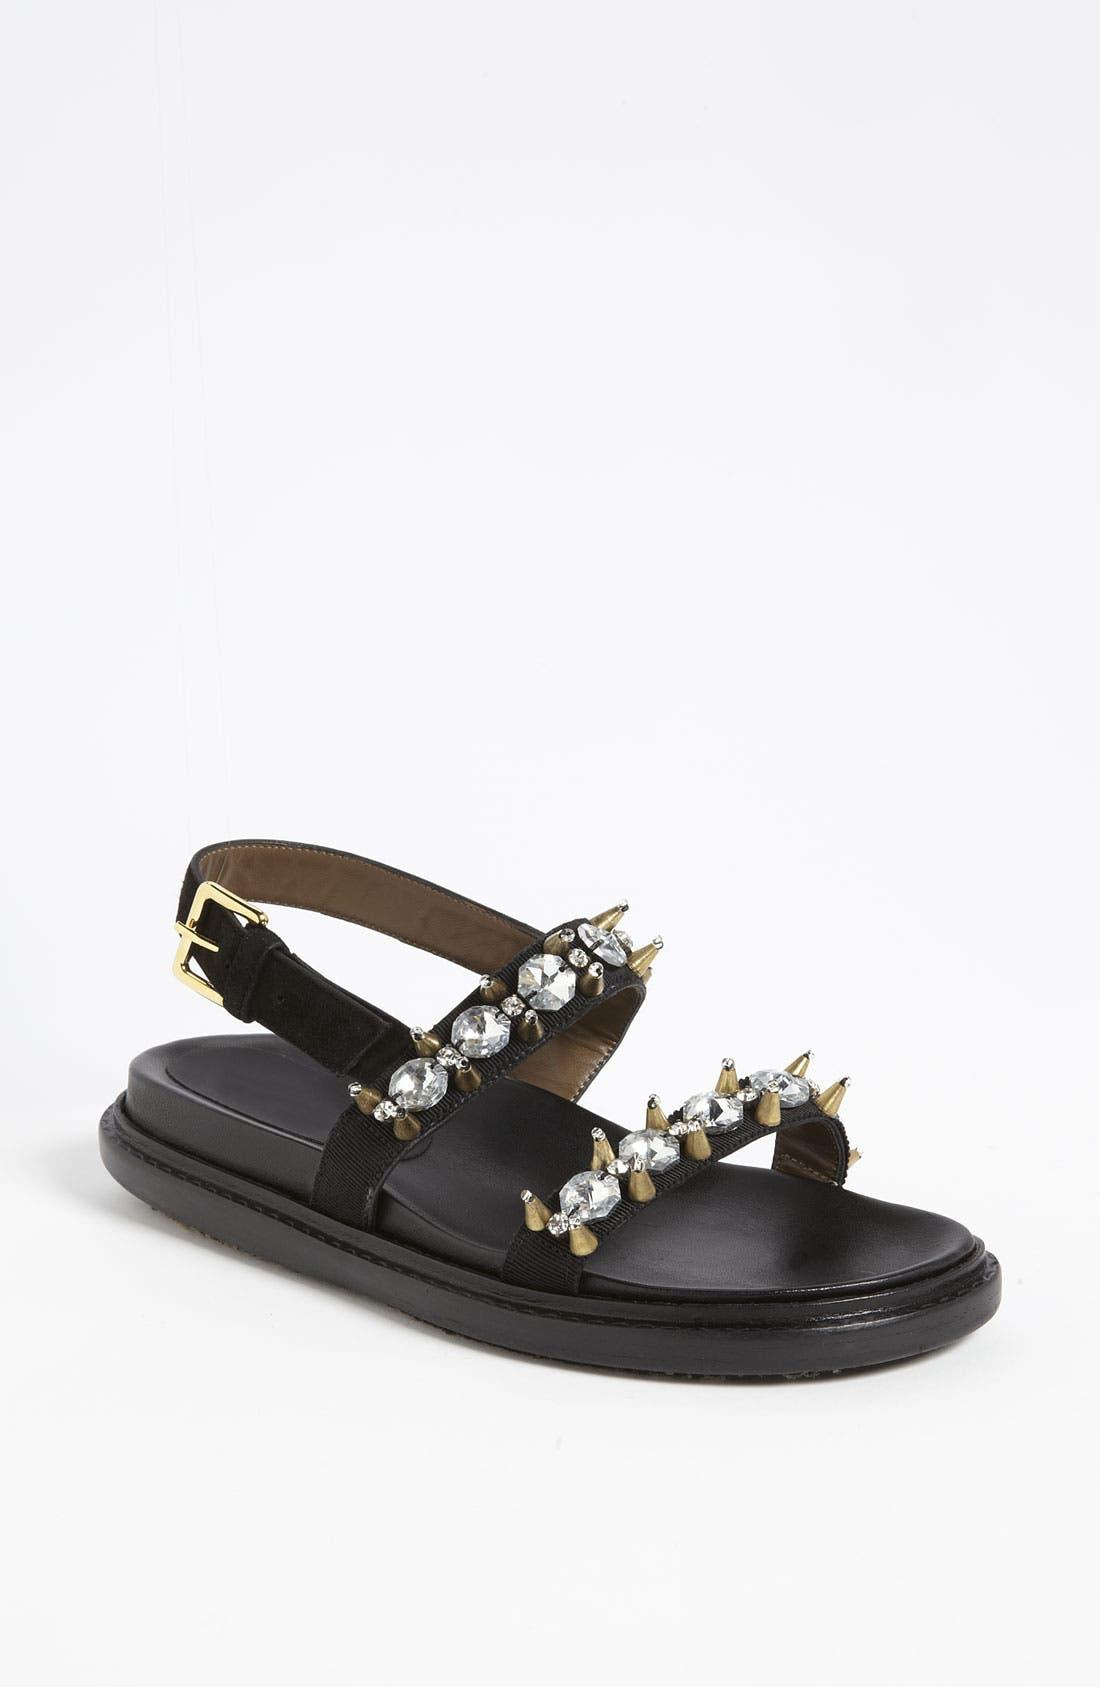 Alternate Image 1 Selected - Marni Crystal Sandal